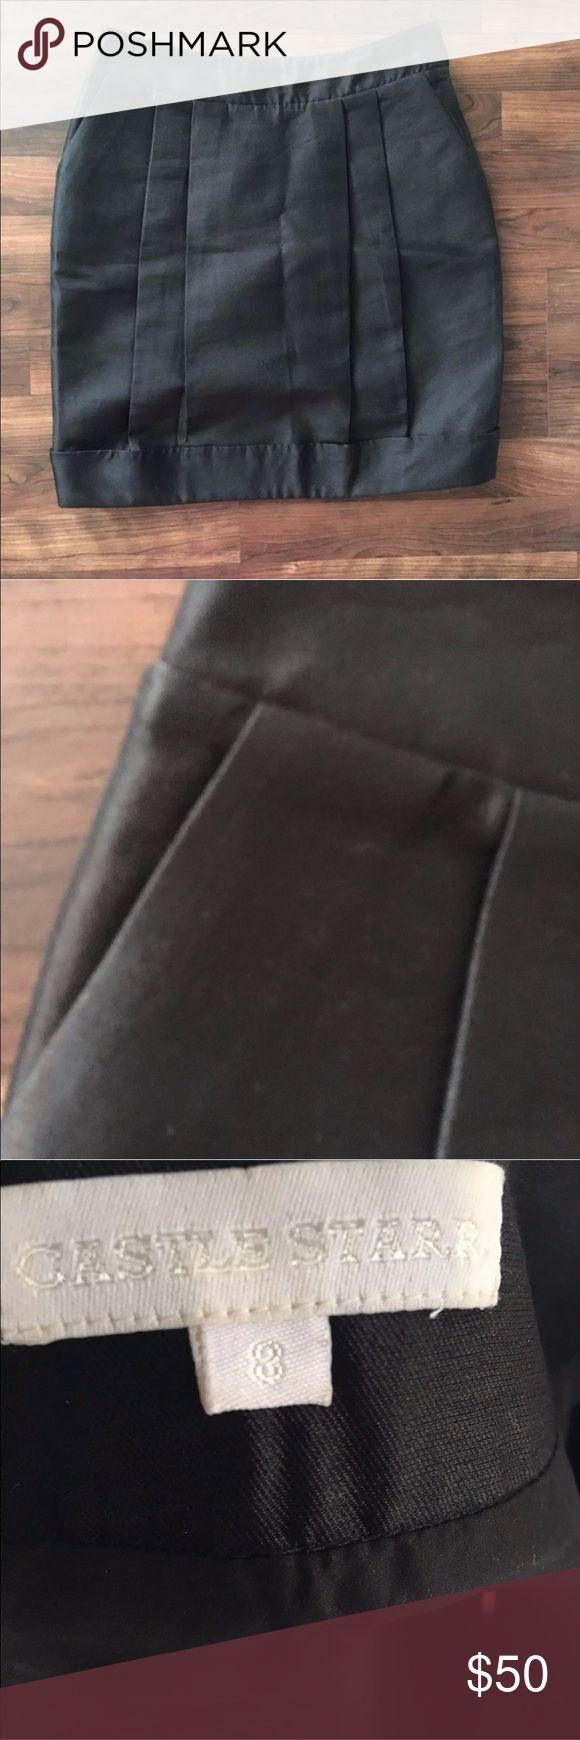 Castle Starr Black Balloon Silk/Wool Skirt Castle Starr Black Balloon Silk/Wool Skirt Like New Castle Starr Skirts Mini